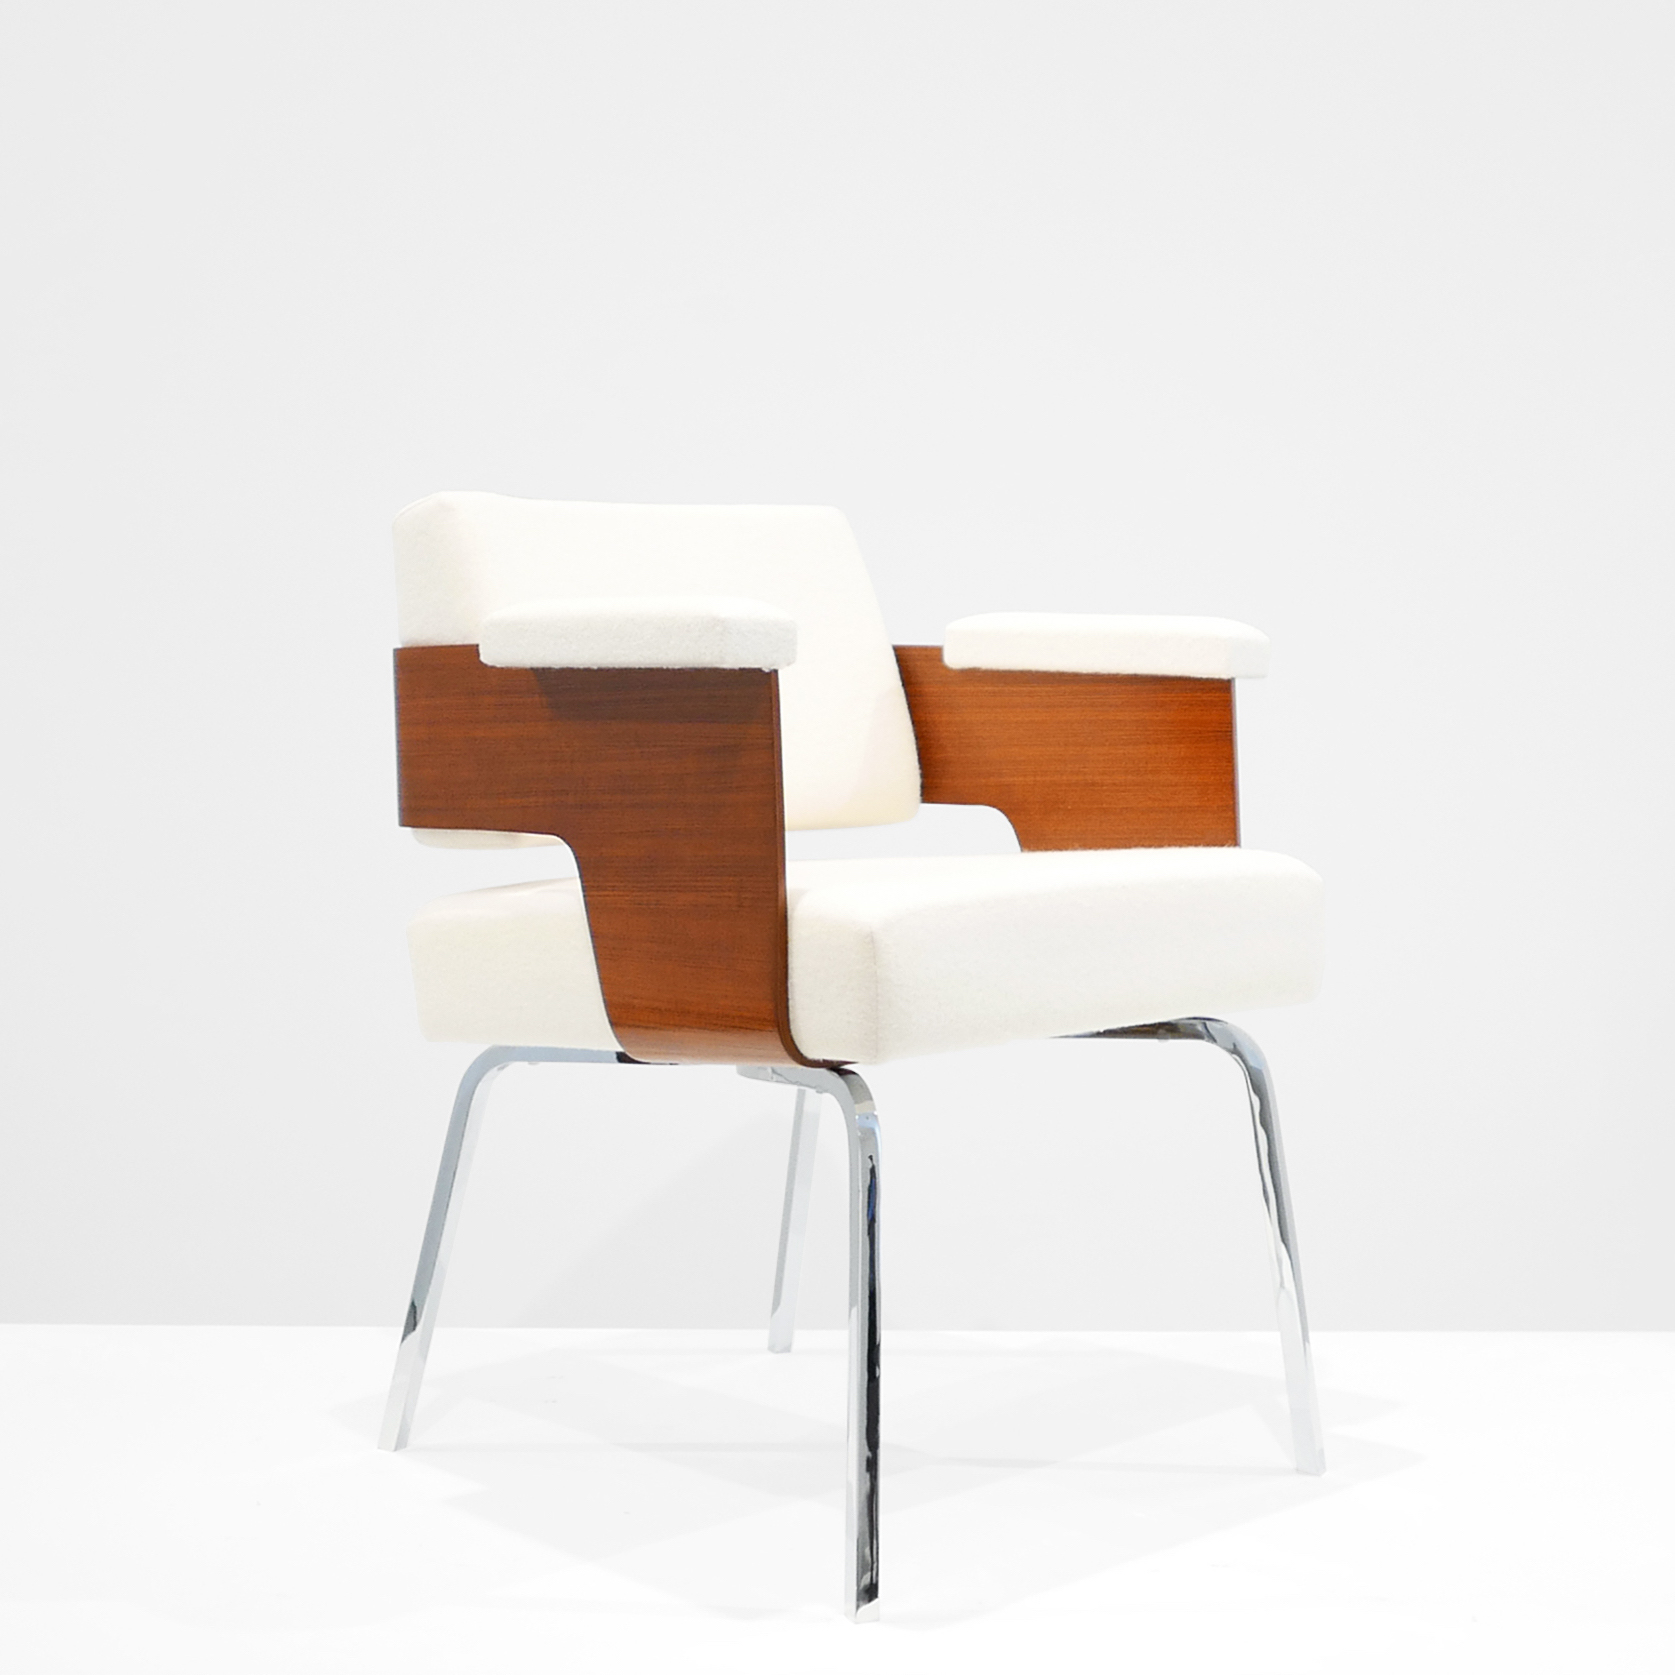 antoine philippon & jacqueline lecoq 'comfort' armchair $15,000